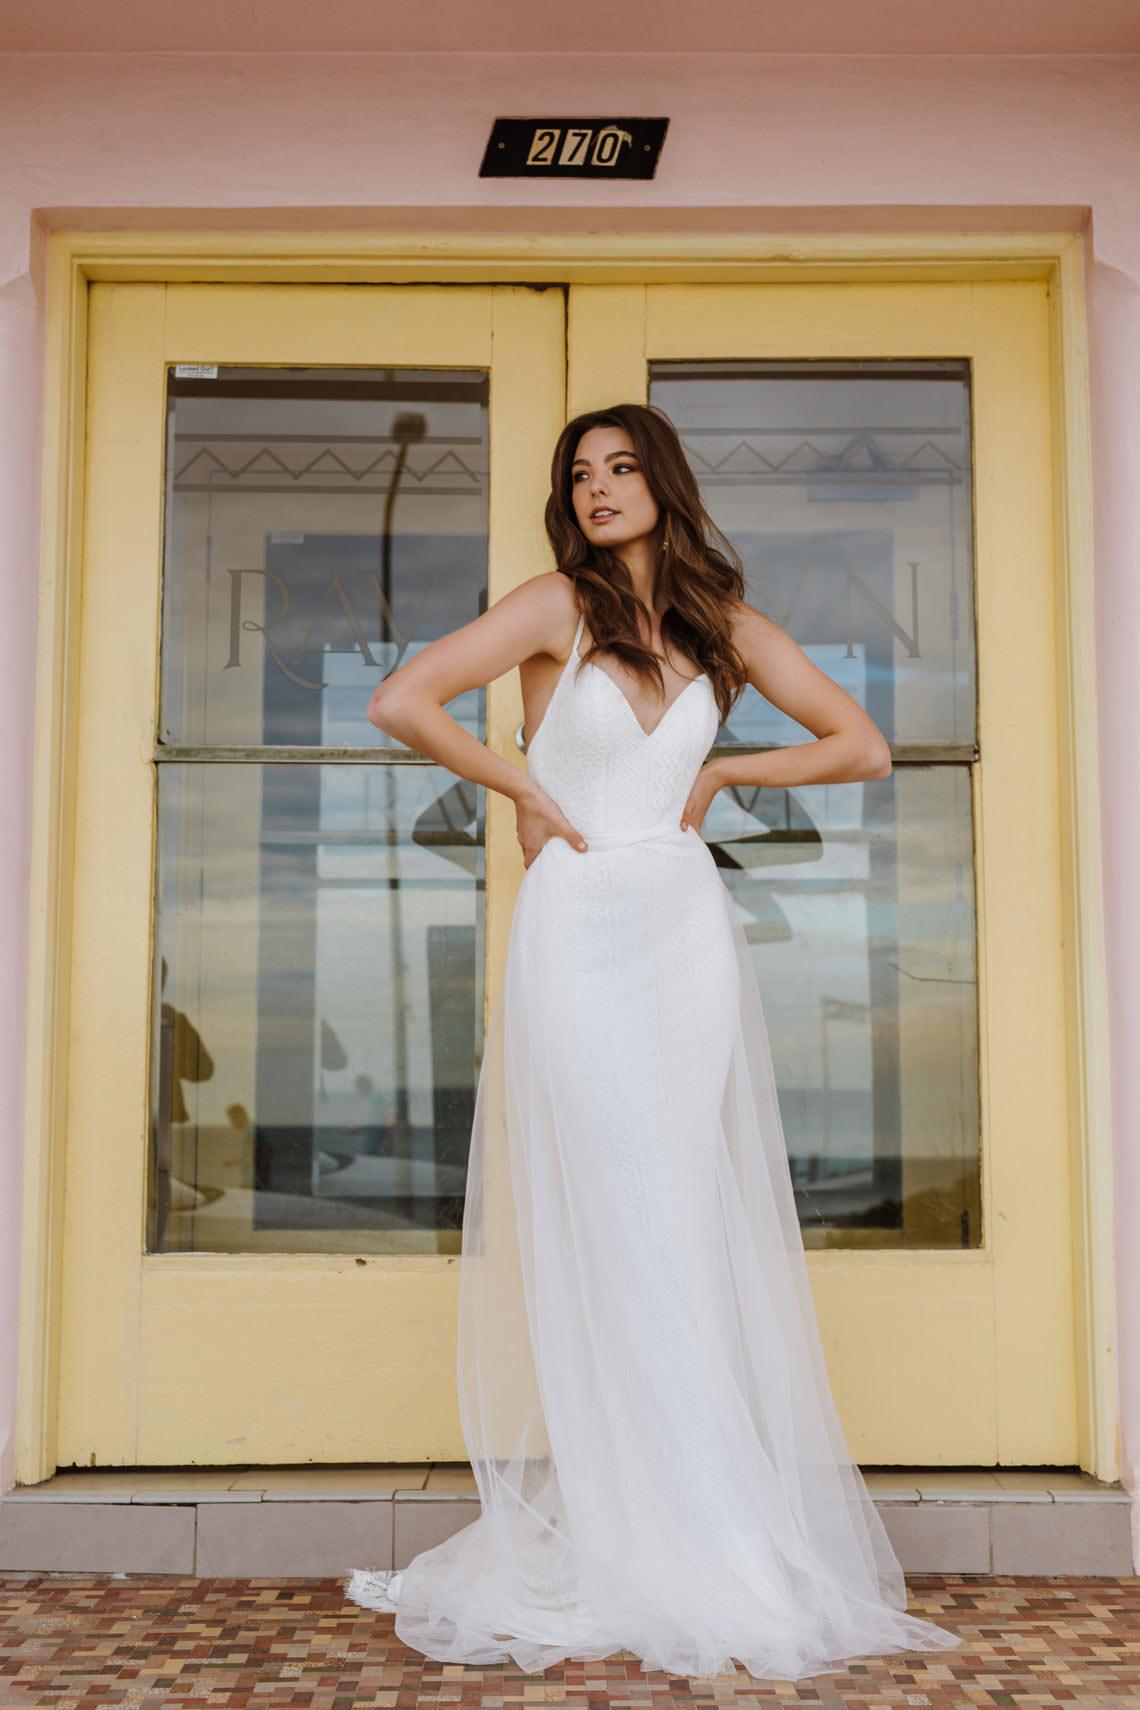 Gardenia daisy Wedding Dress wedding dresses bridal shop store gowns christchurch wellington